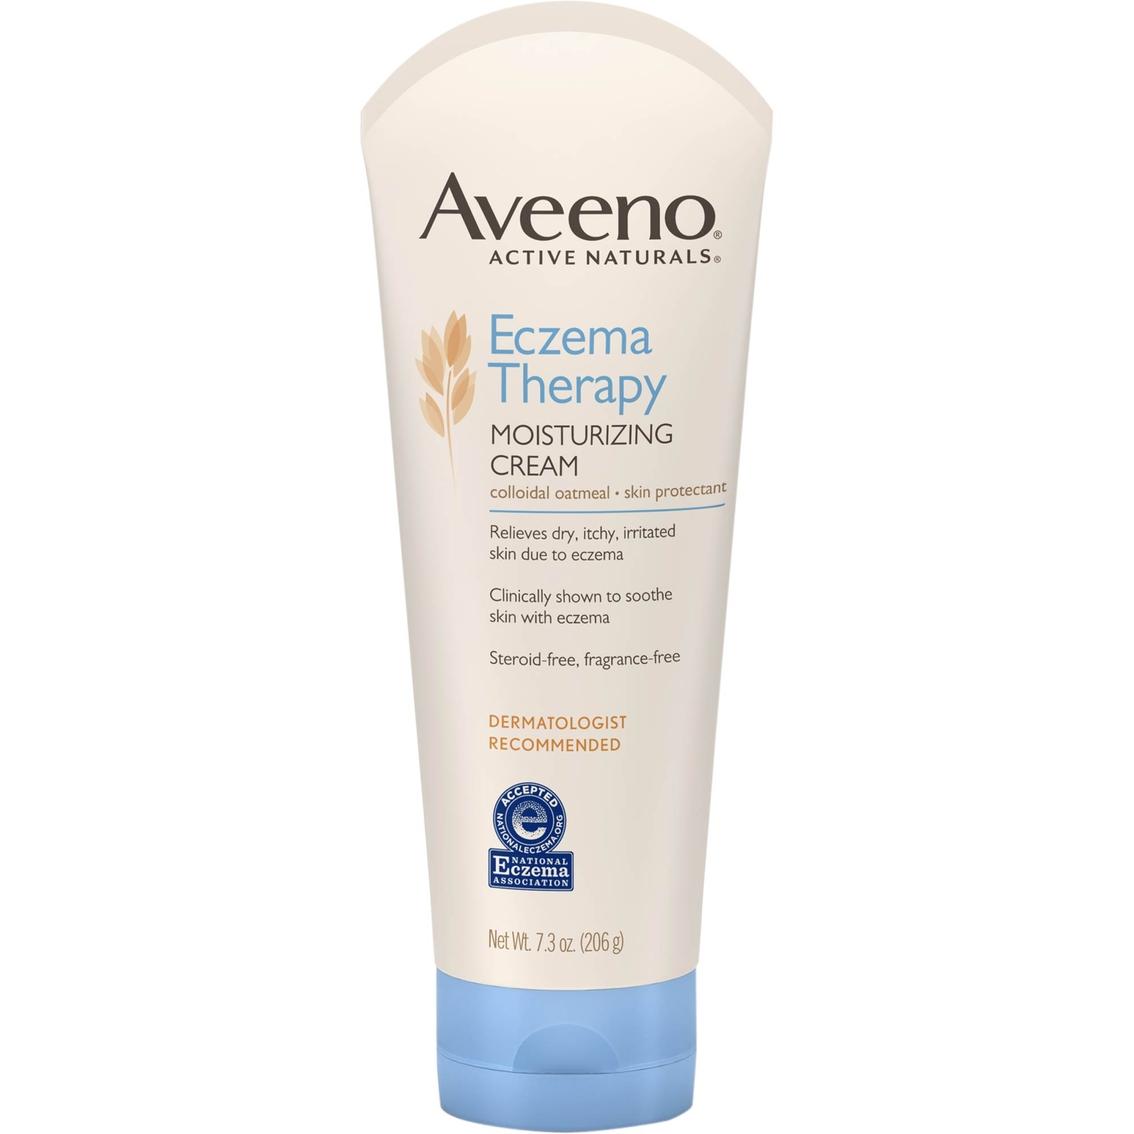 Aveeno Anti-itch Eczema Therapy Moisturizing Cream